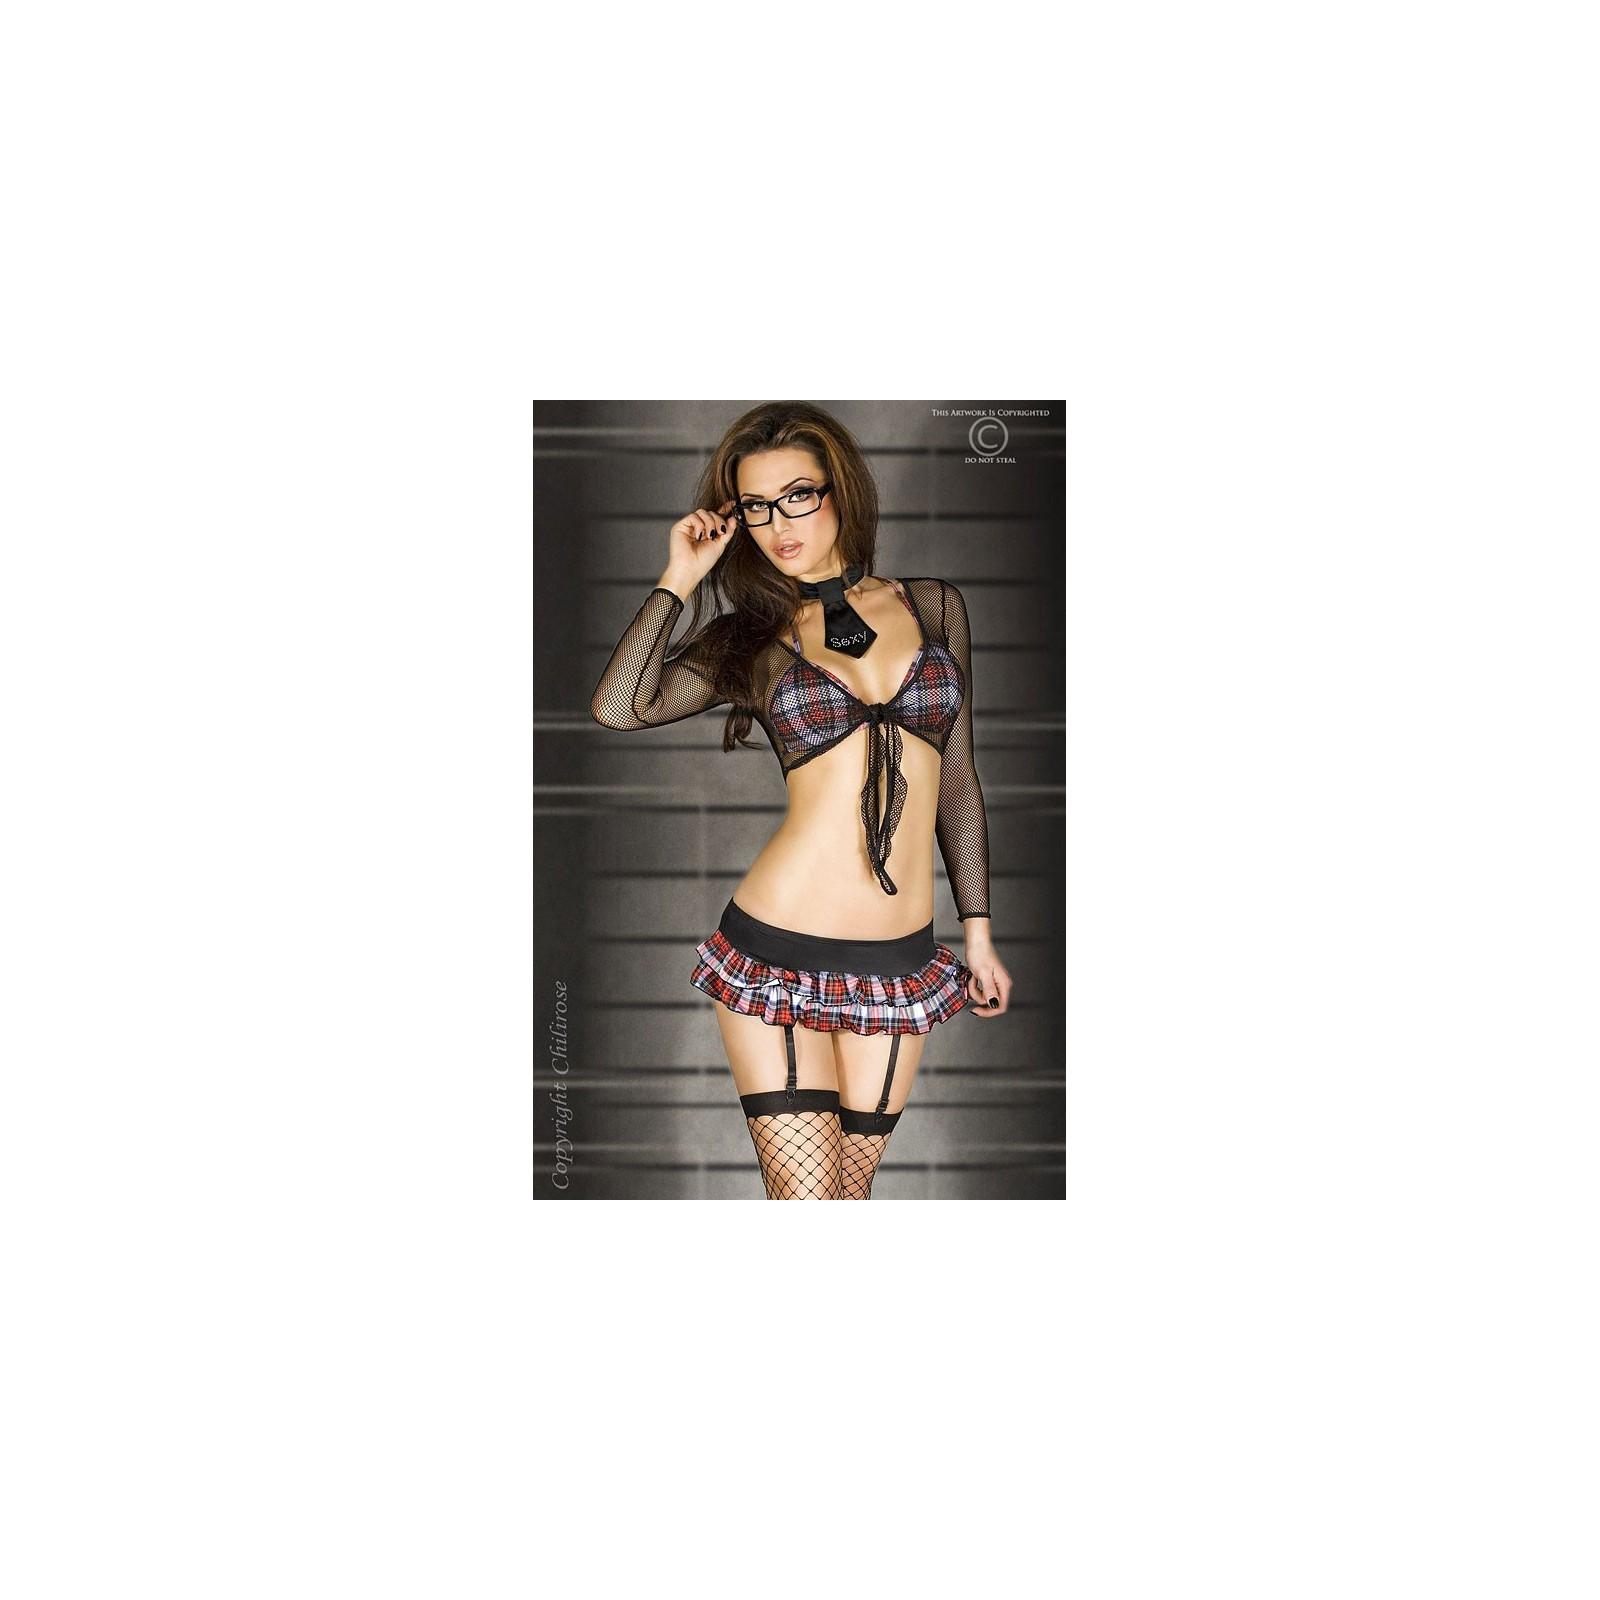 Schoolgirl Set CR3304 - 4 - Vorschaubild